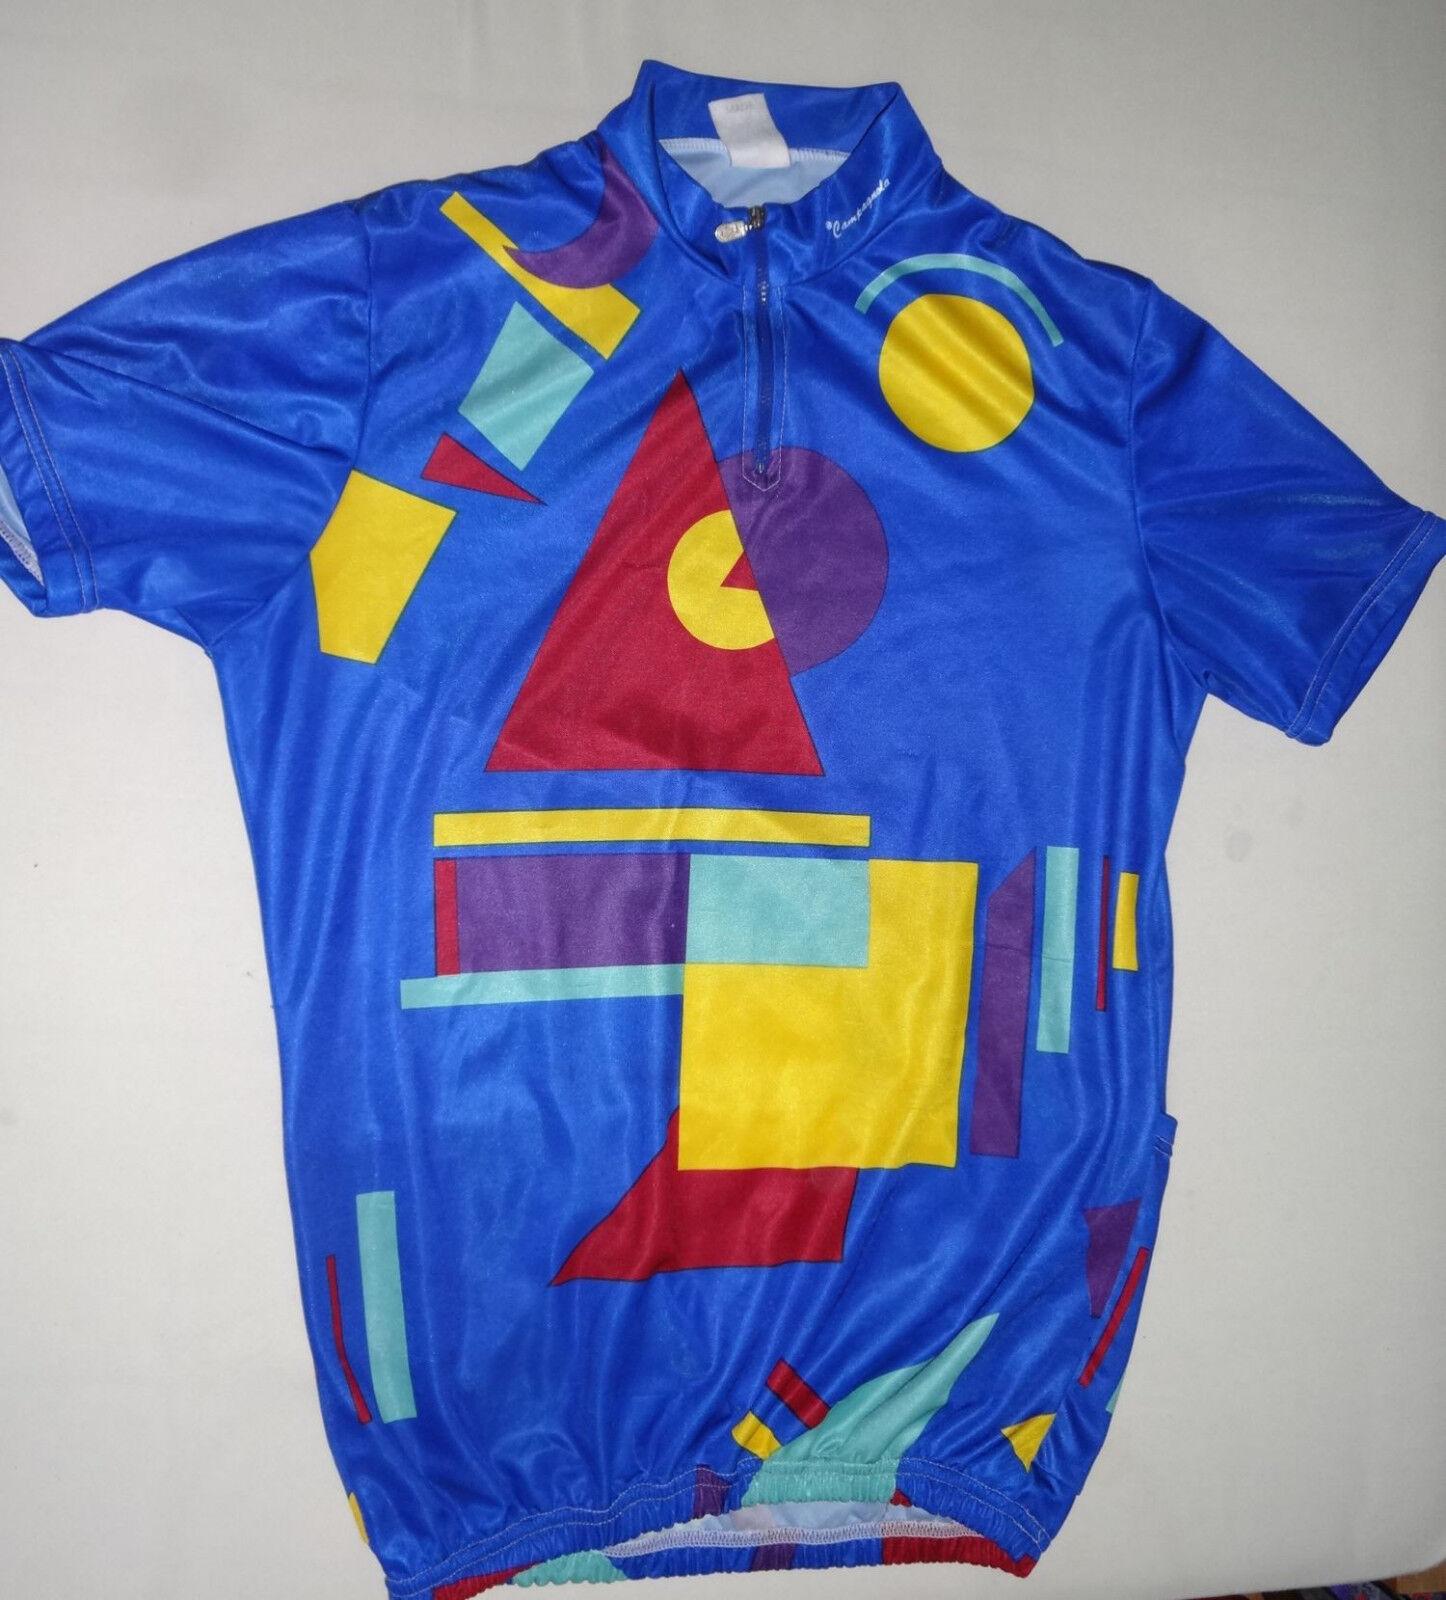 Campagnola Rennrad Fahrrad Mountainbike Trikot Gr. XL oder 5 in blue Campagnolo